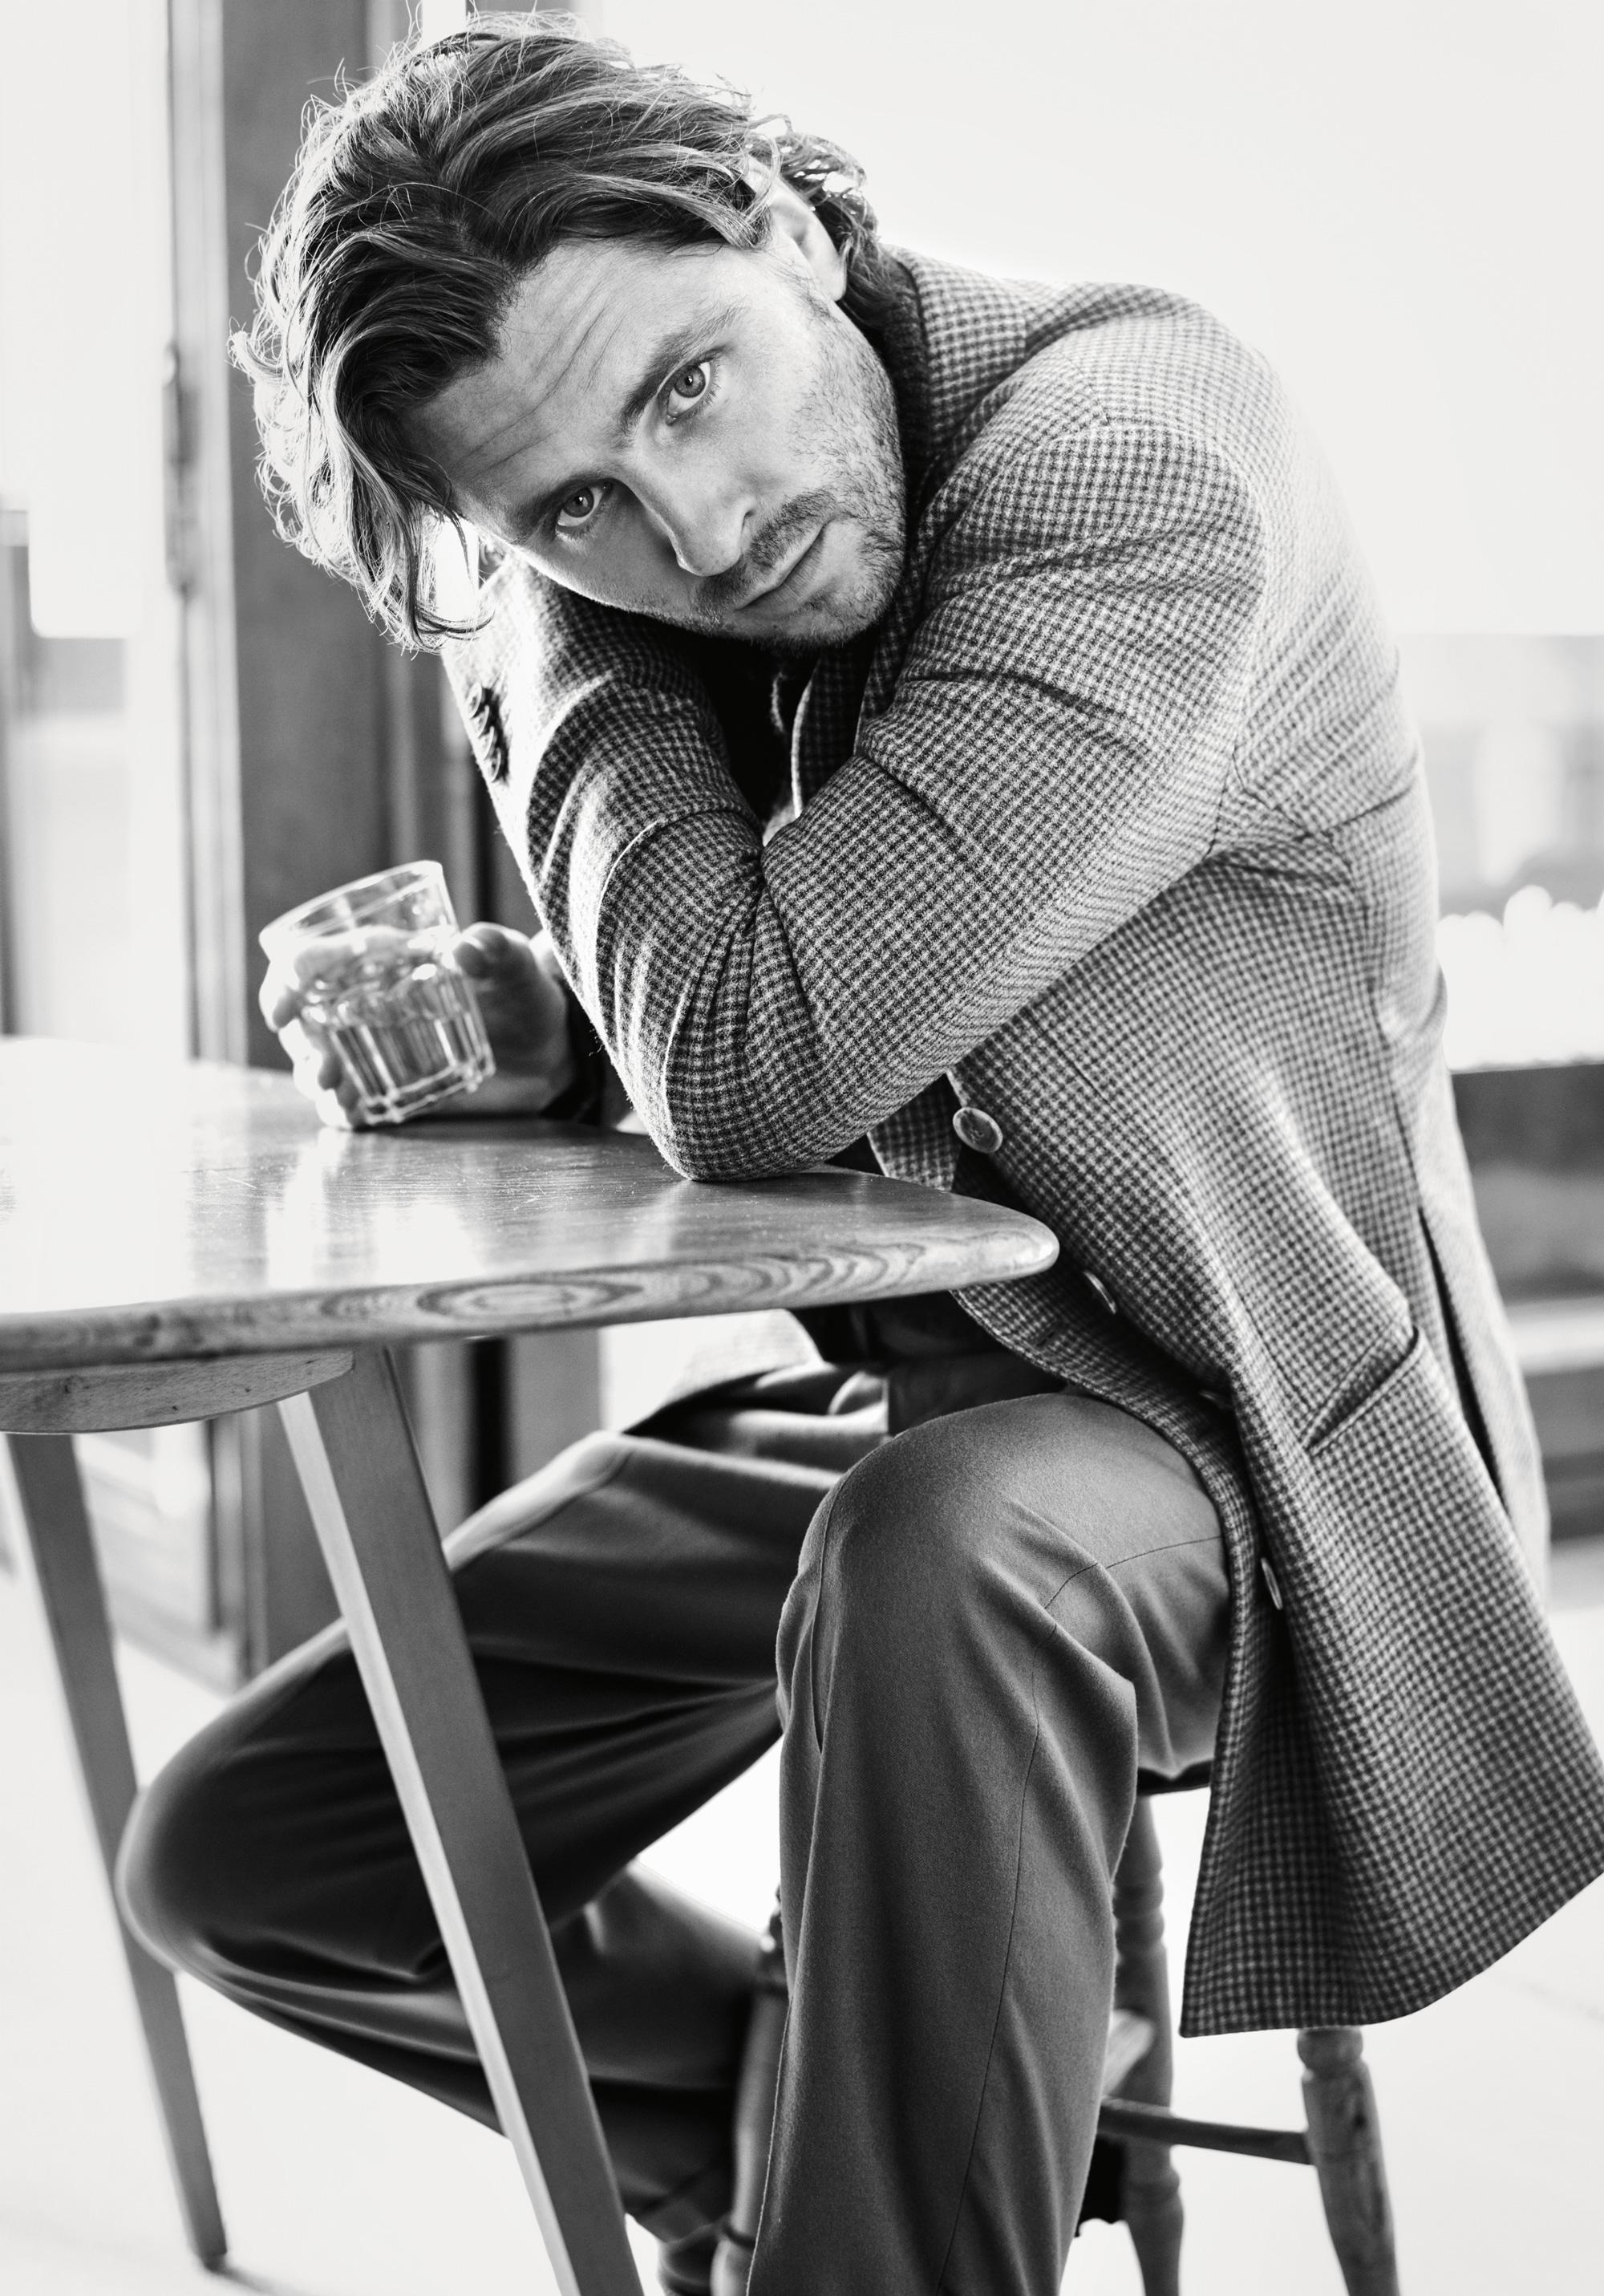 Пиджак, джемпер, брюки, все Giorgio Armani